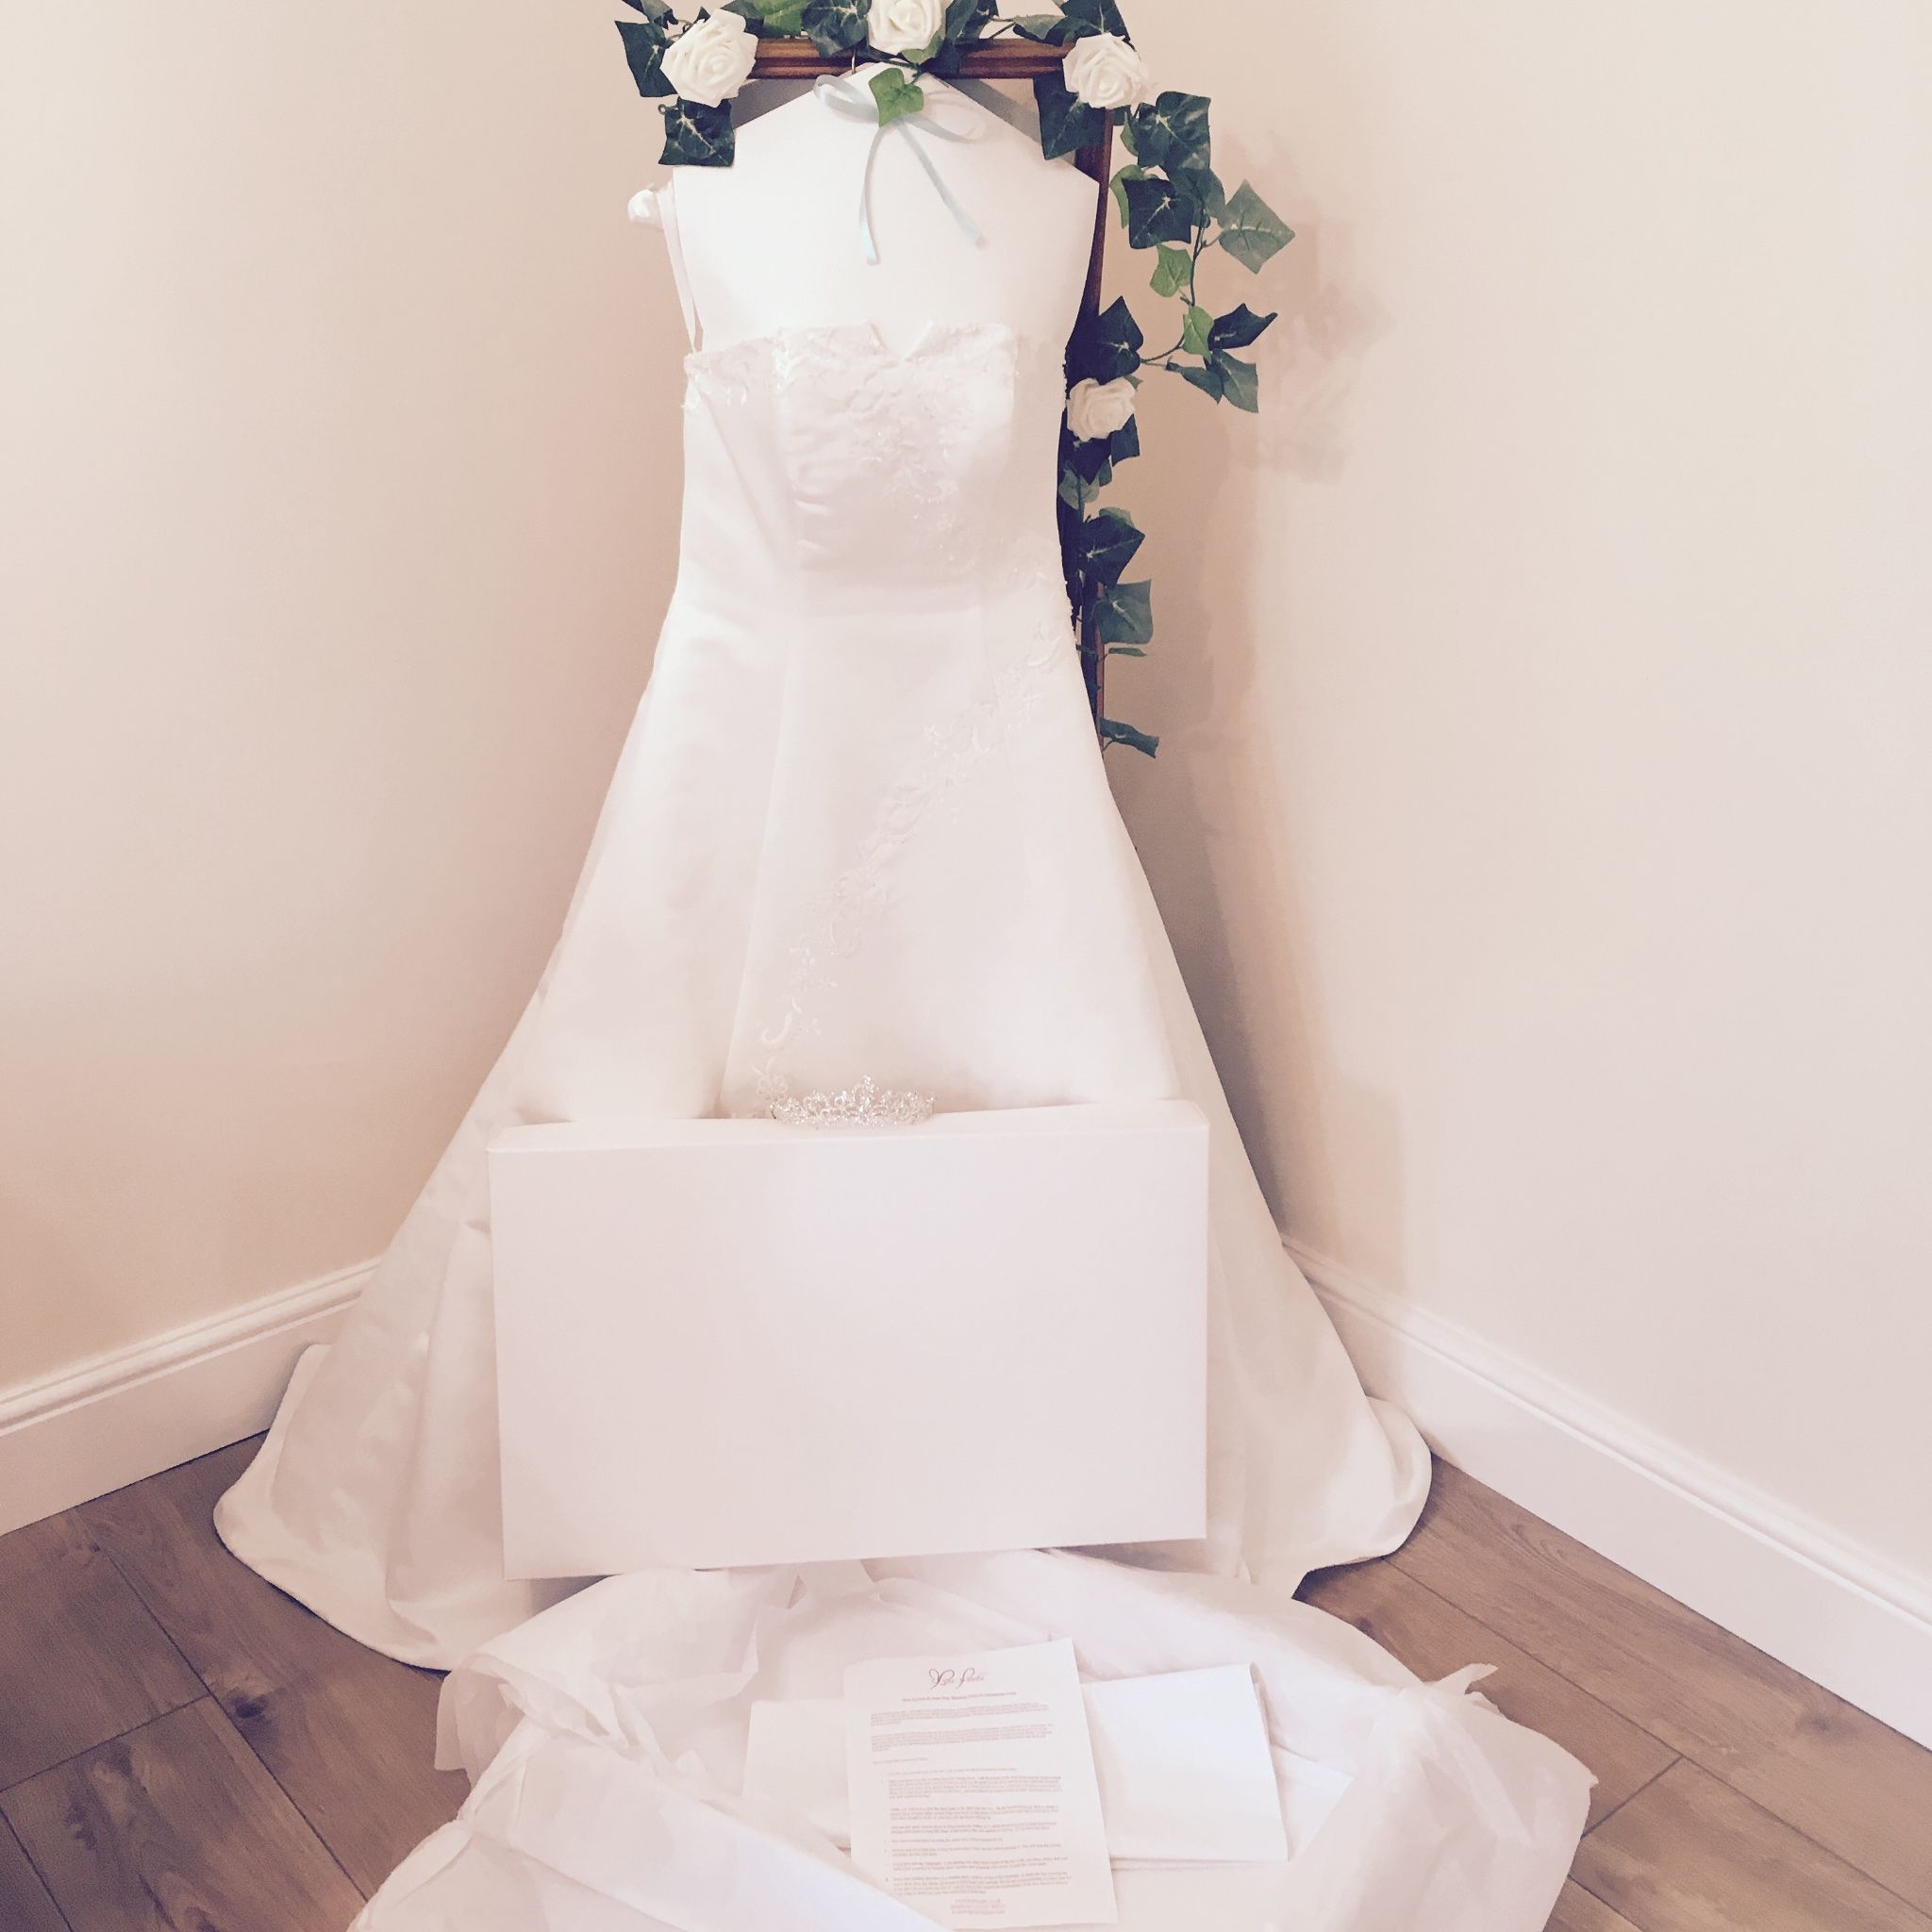 0a6499a6f5 wedding dress storage preservation box